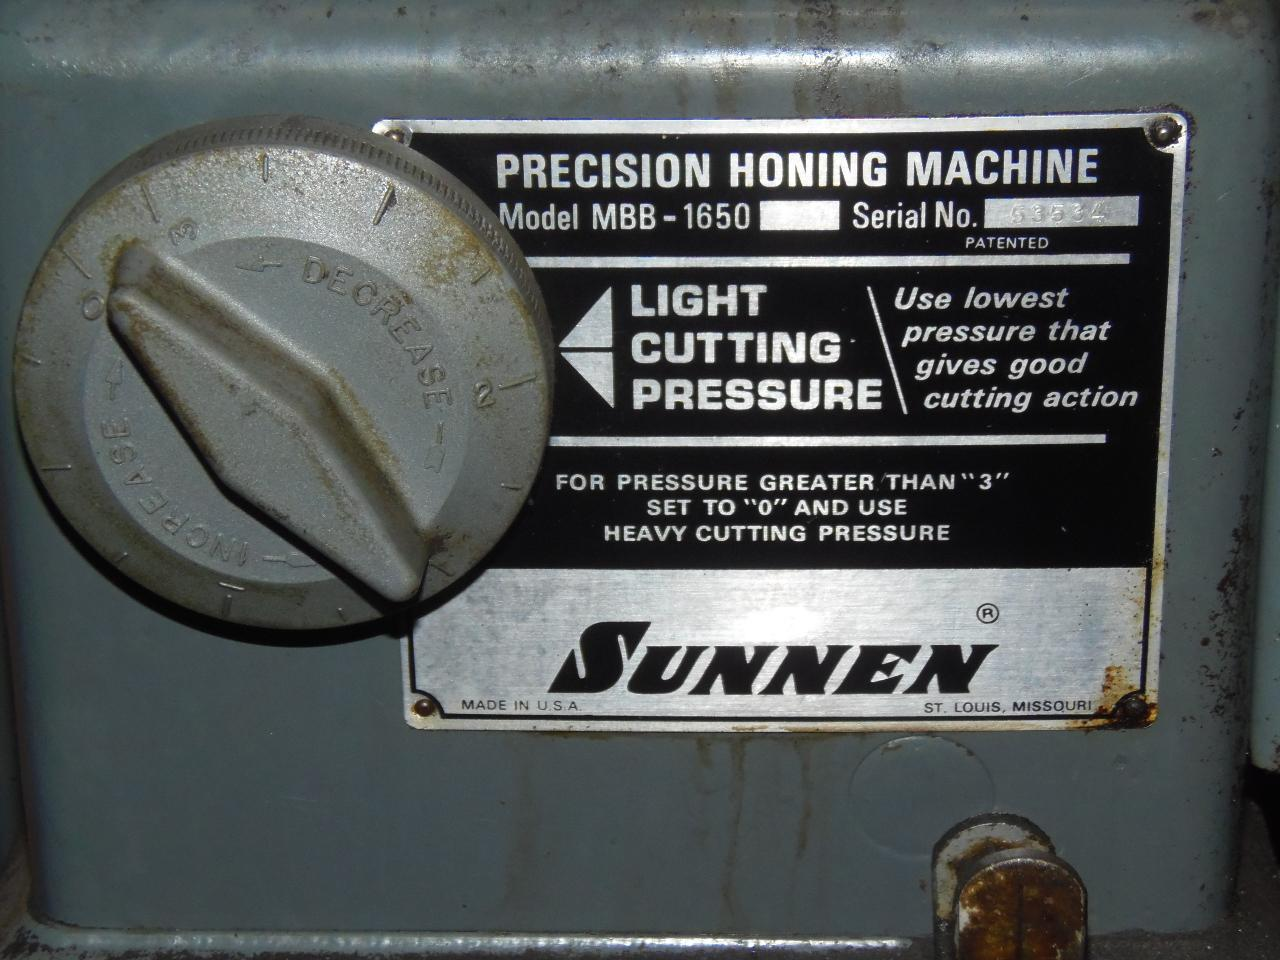 SUNNEN PRECISION HORIZONTAL HONING MACHINE, MODEL MBB-1650K/C, MISC. TOOLING